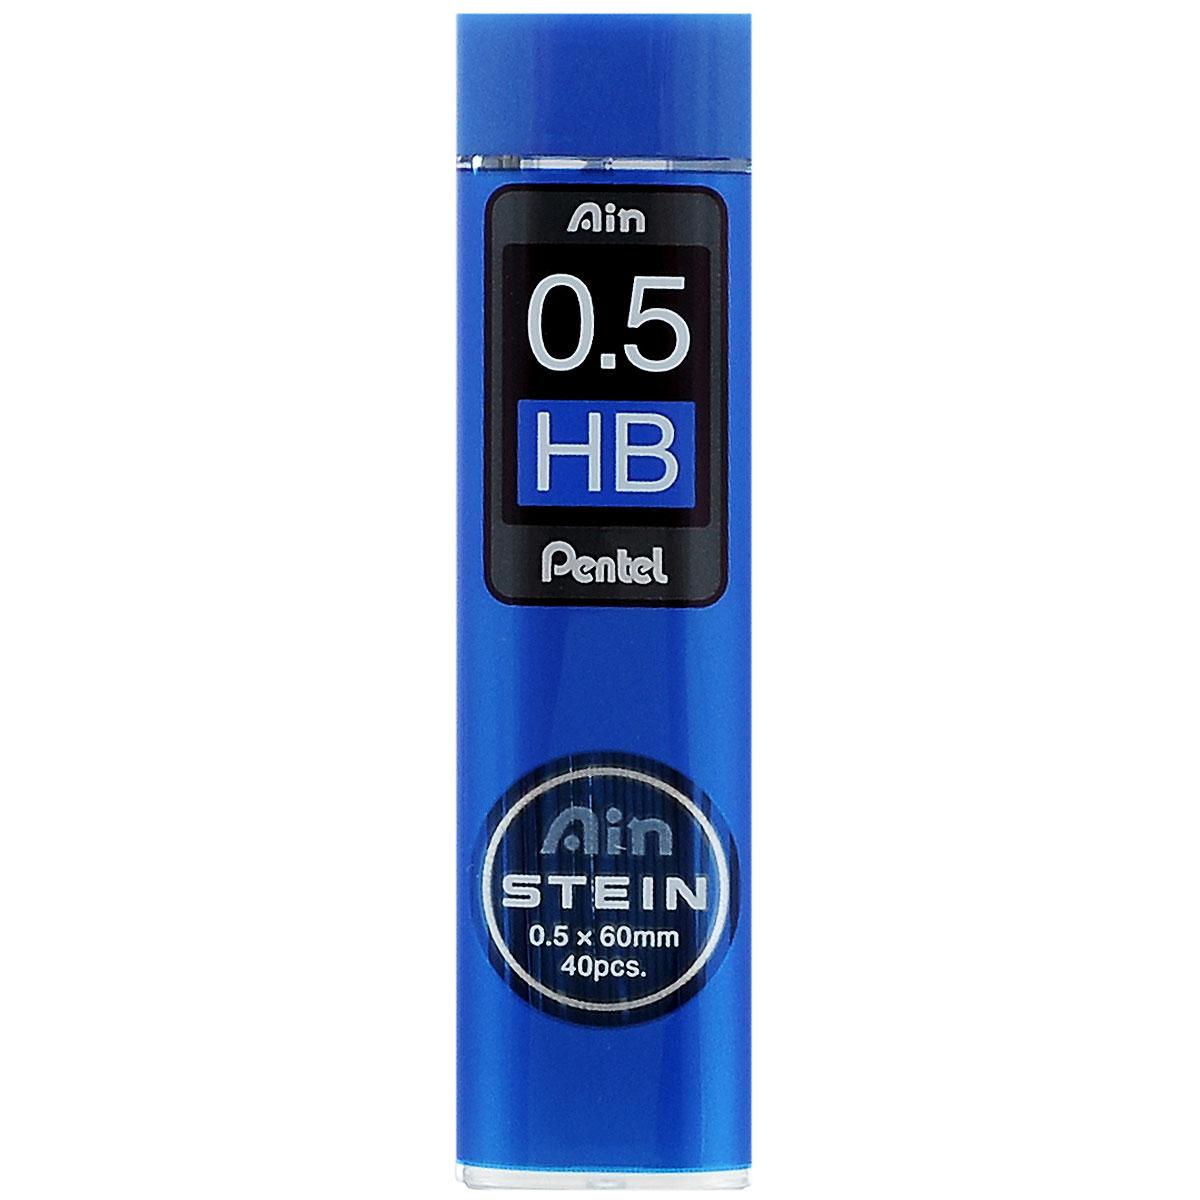 "Pentel Грифели для автоматических карандашей ""Ain Stein"", HB, 0,5 мм, 40 шт"